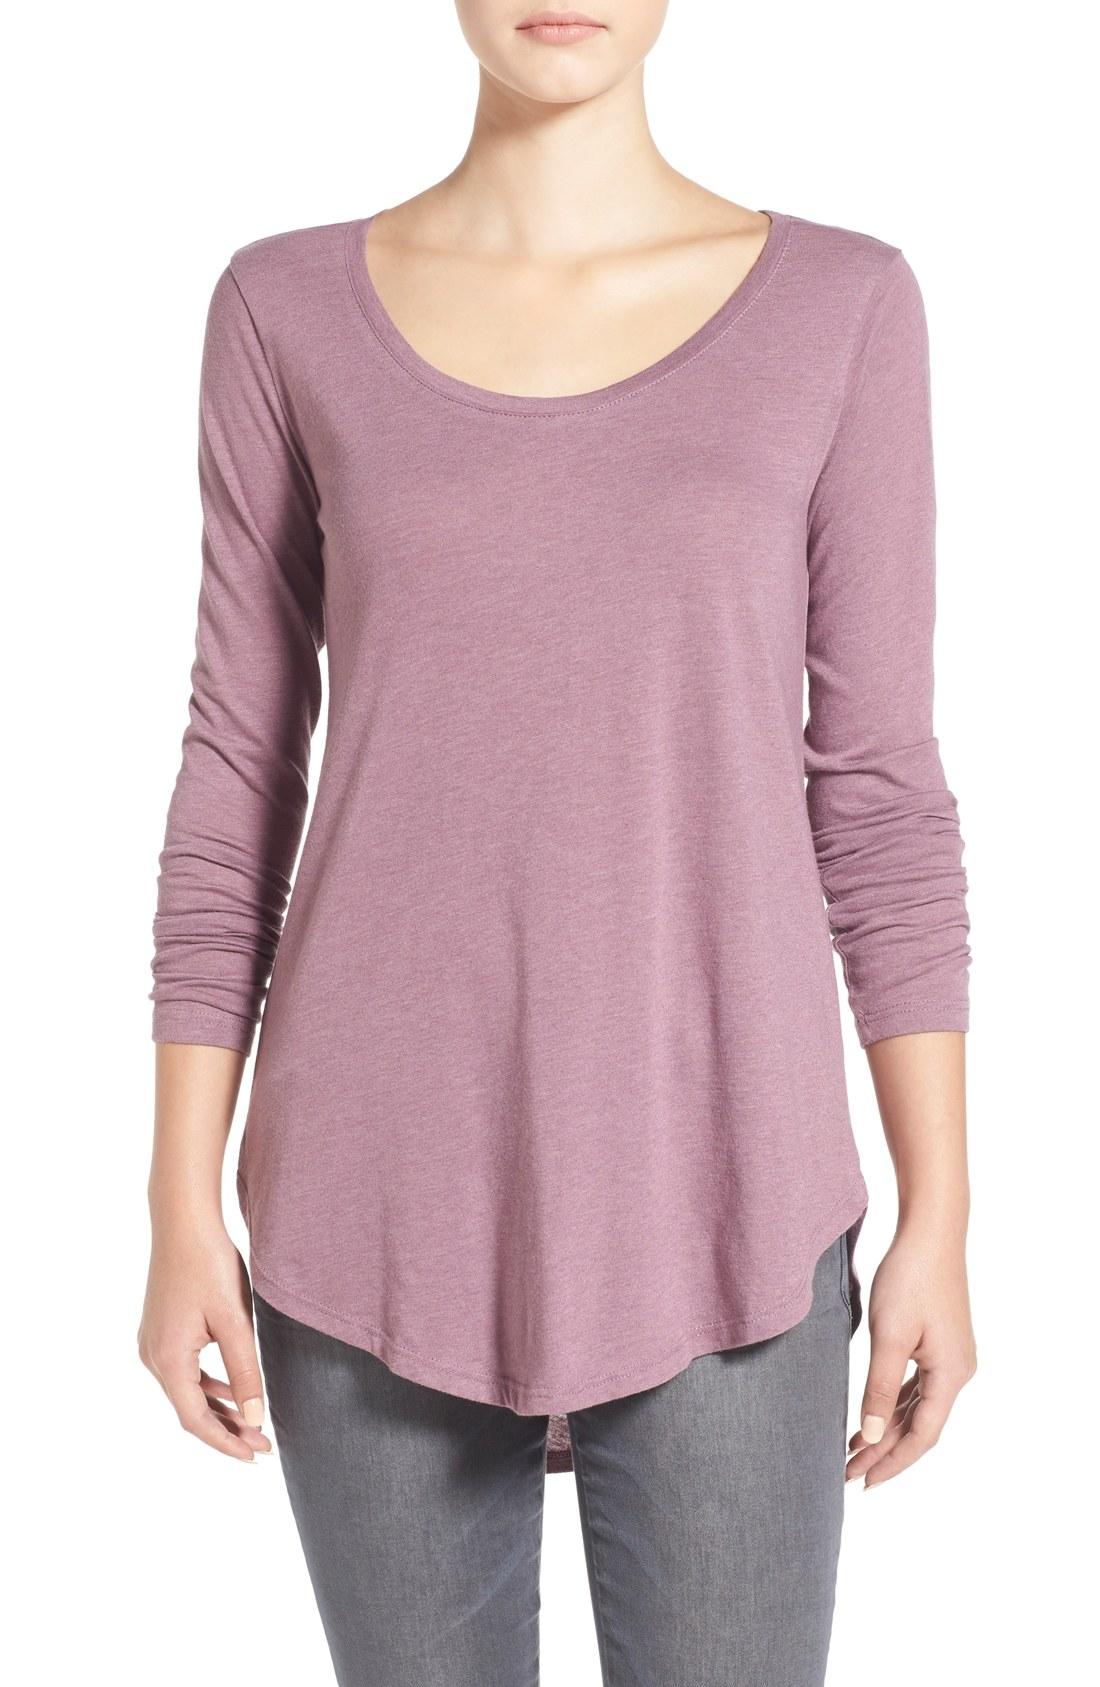 Bp scoop neck long sleeve tee nordstrom for Long sleeve scoop neck shirt